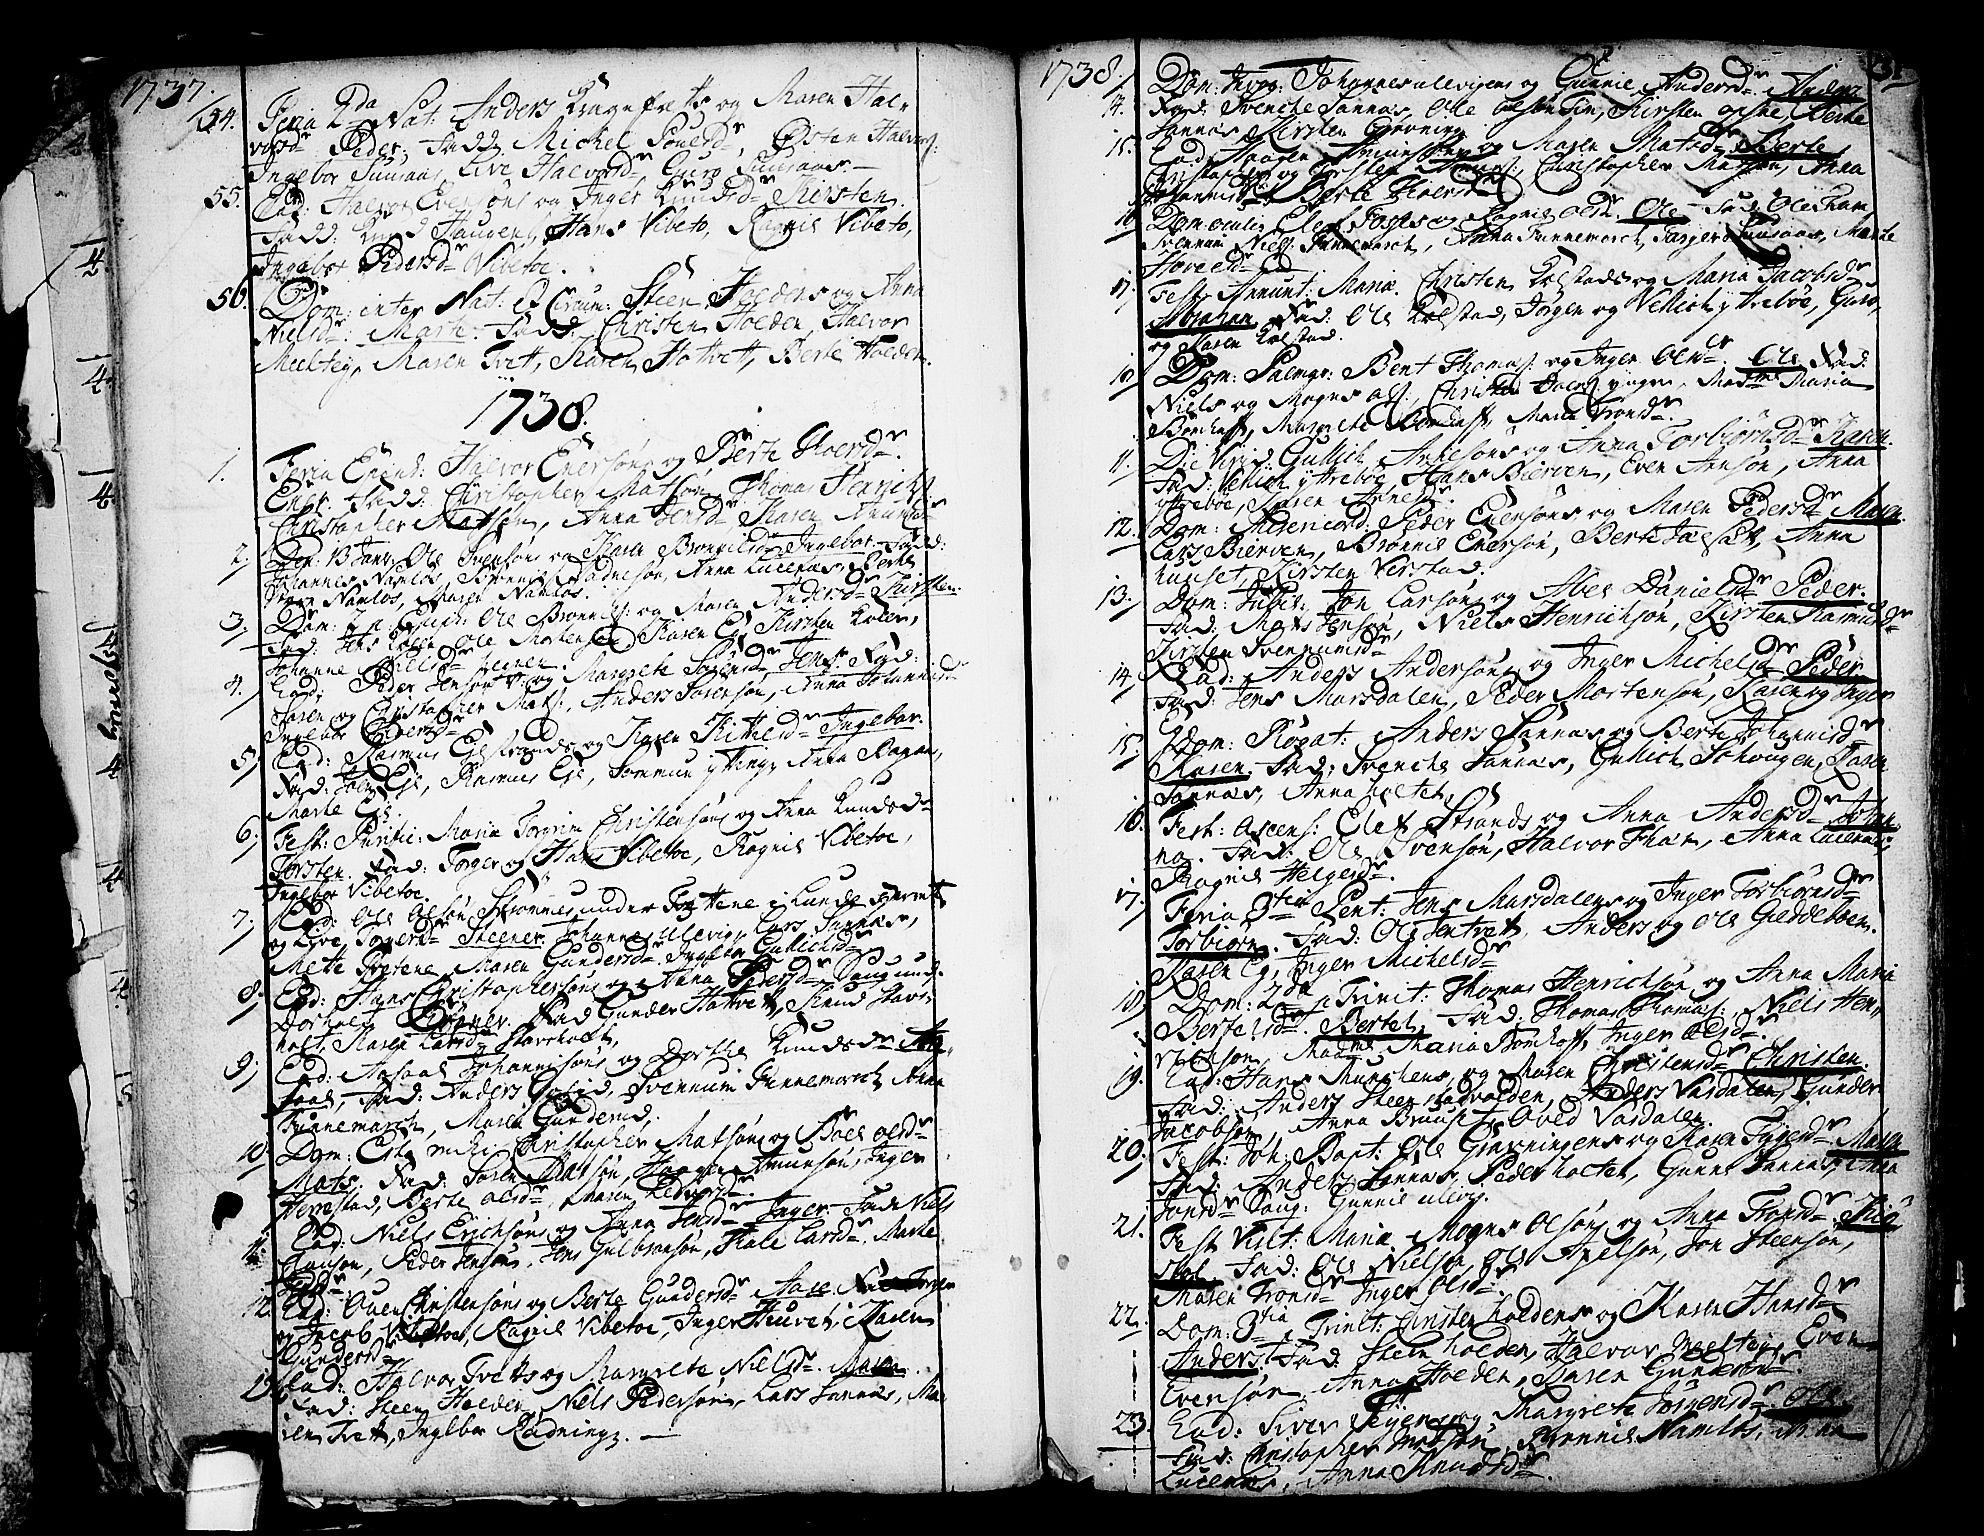 SAKO, Holla kirkebøker, F/Fa/L0001: Ministerialbok nr. 1, 1717-1779, s. 31